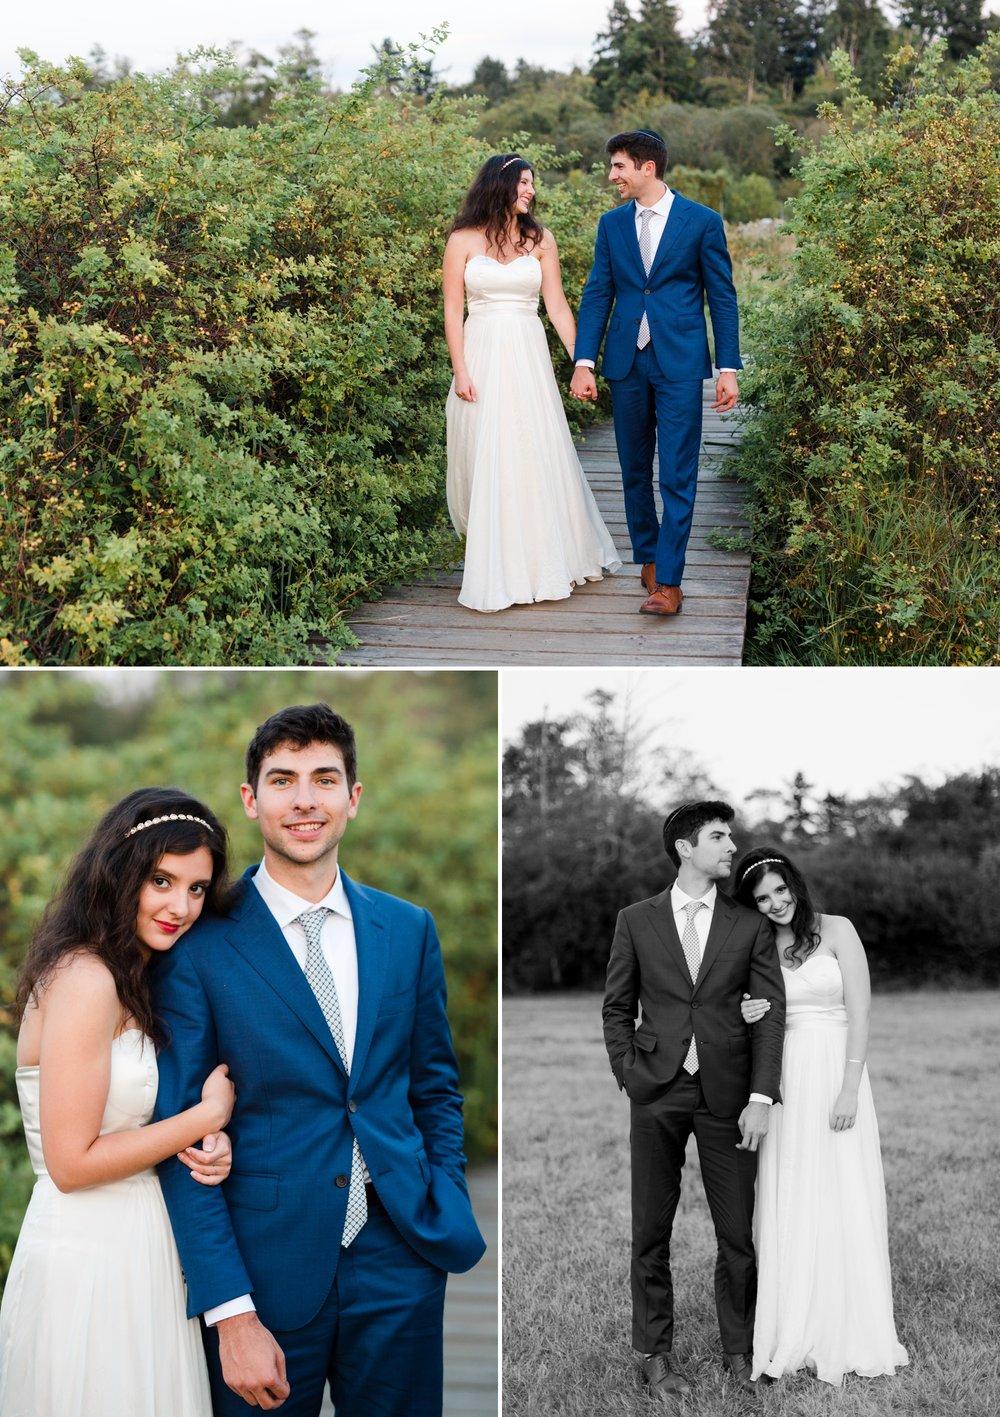 19-wedding-couple-portraits-seattle-normandy-park.jpg